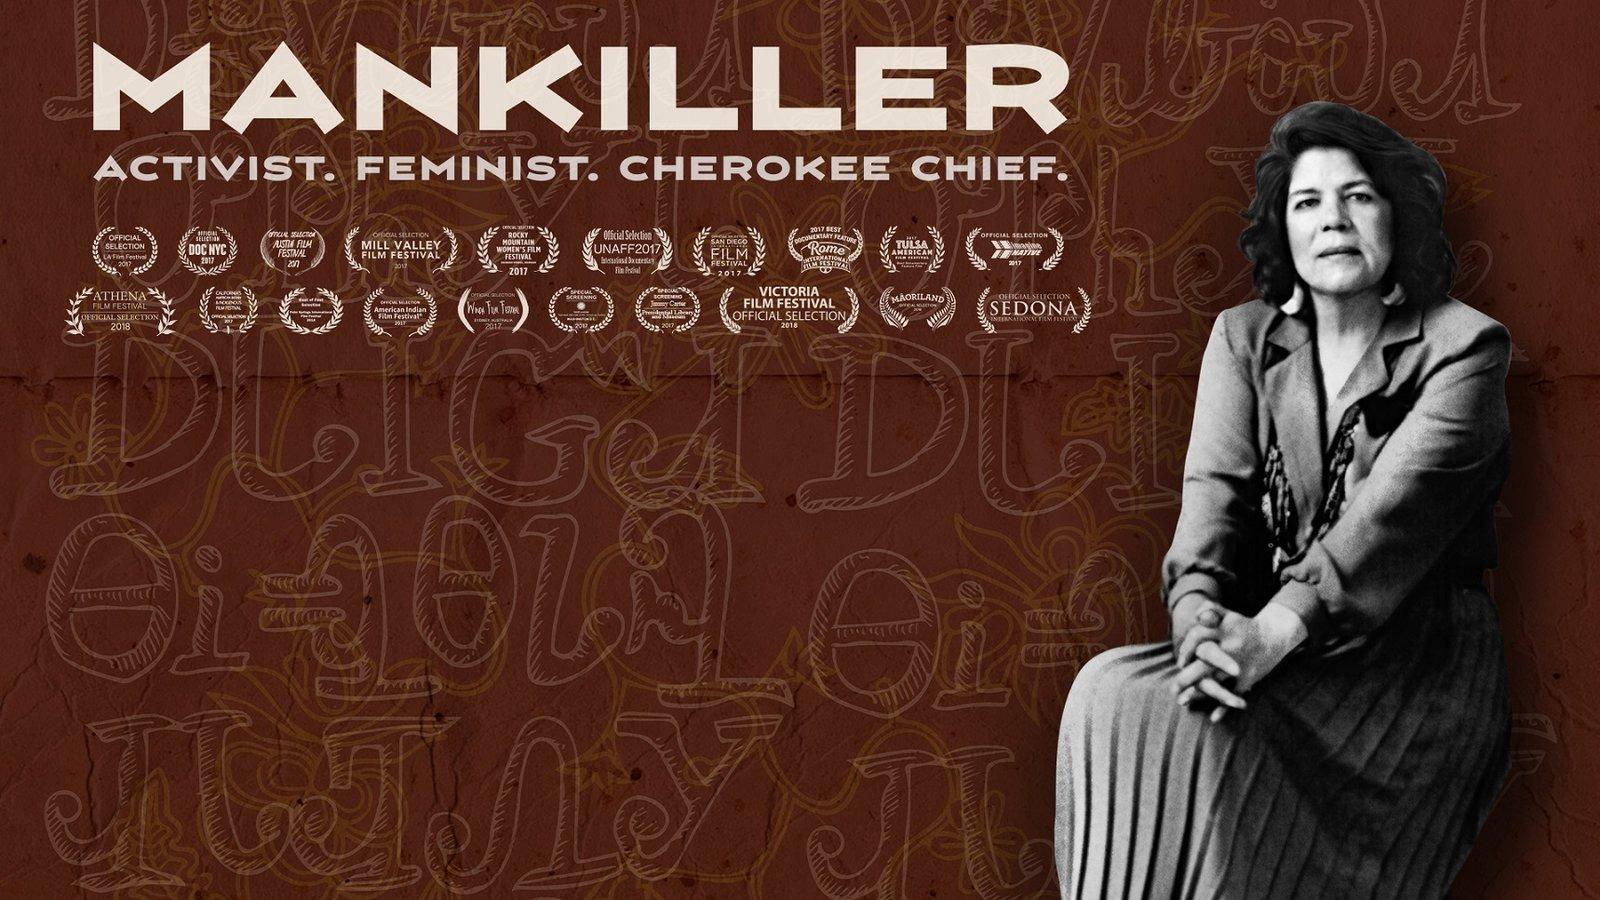 Mankiller - Activist. Feminist. Cherokee Chief.